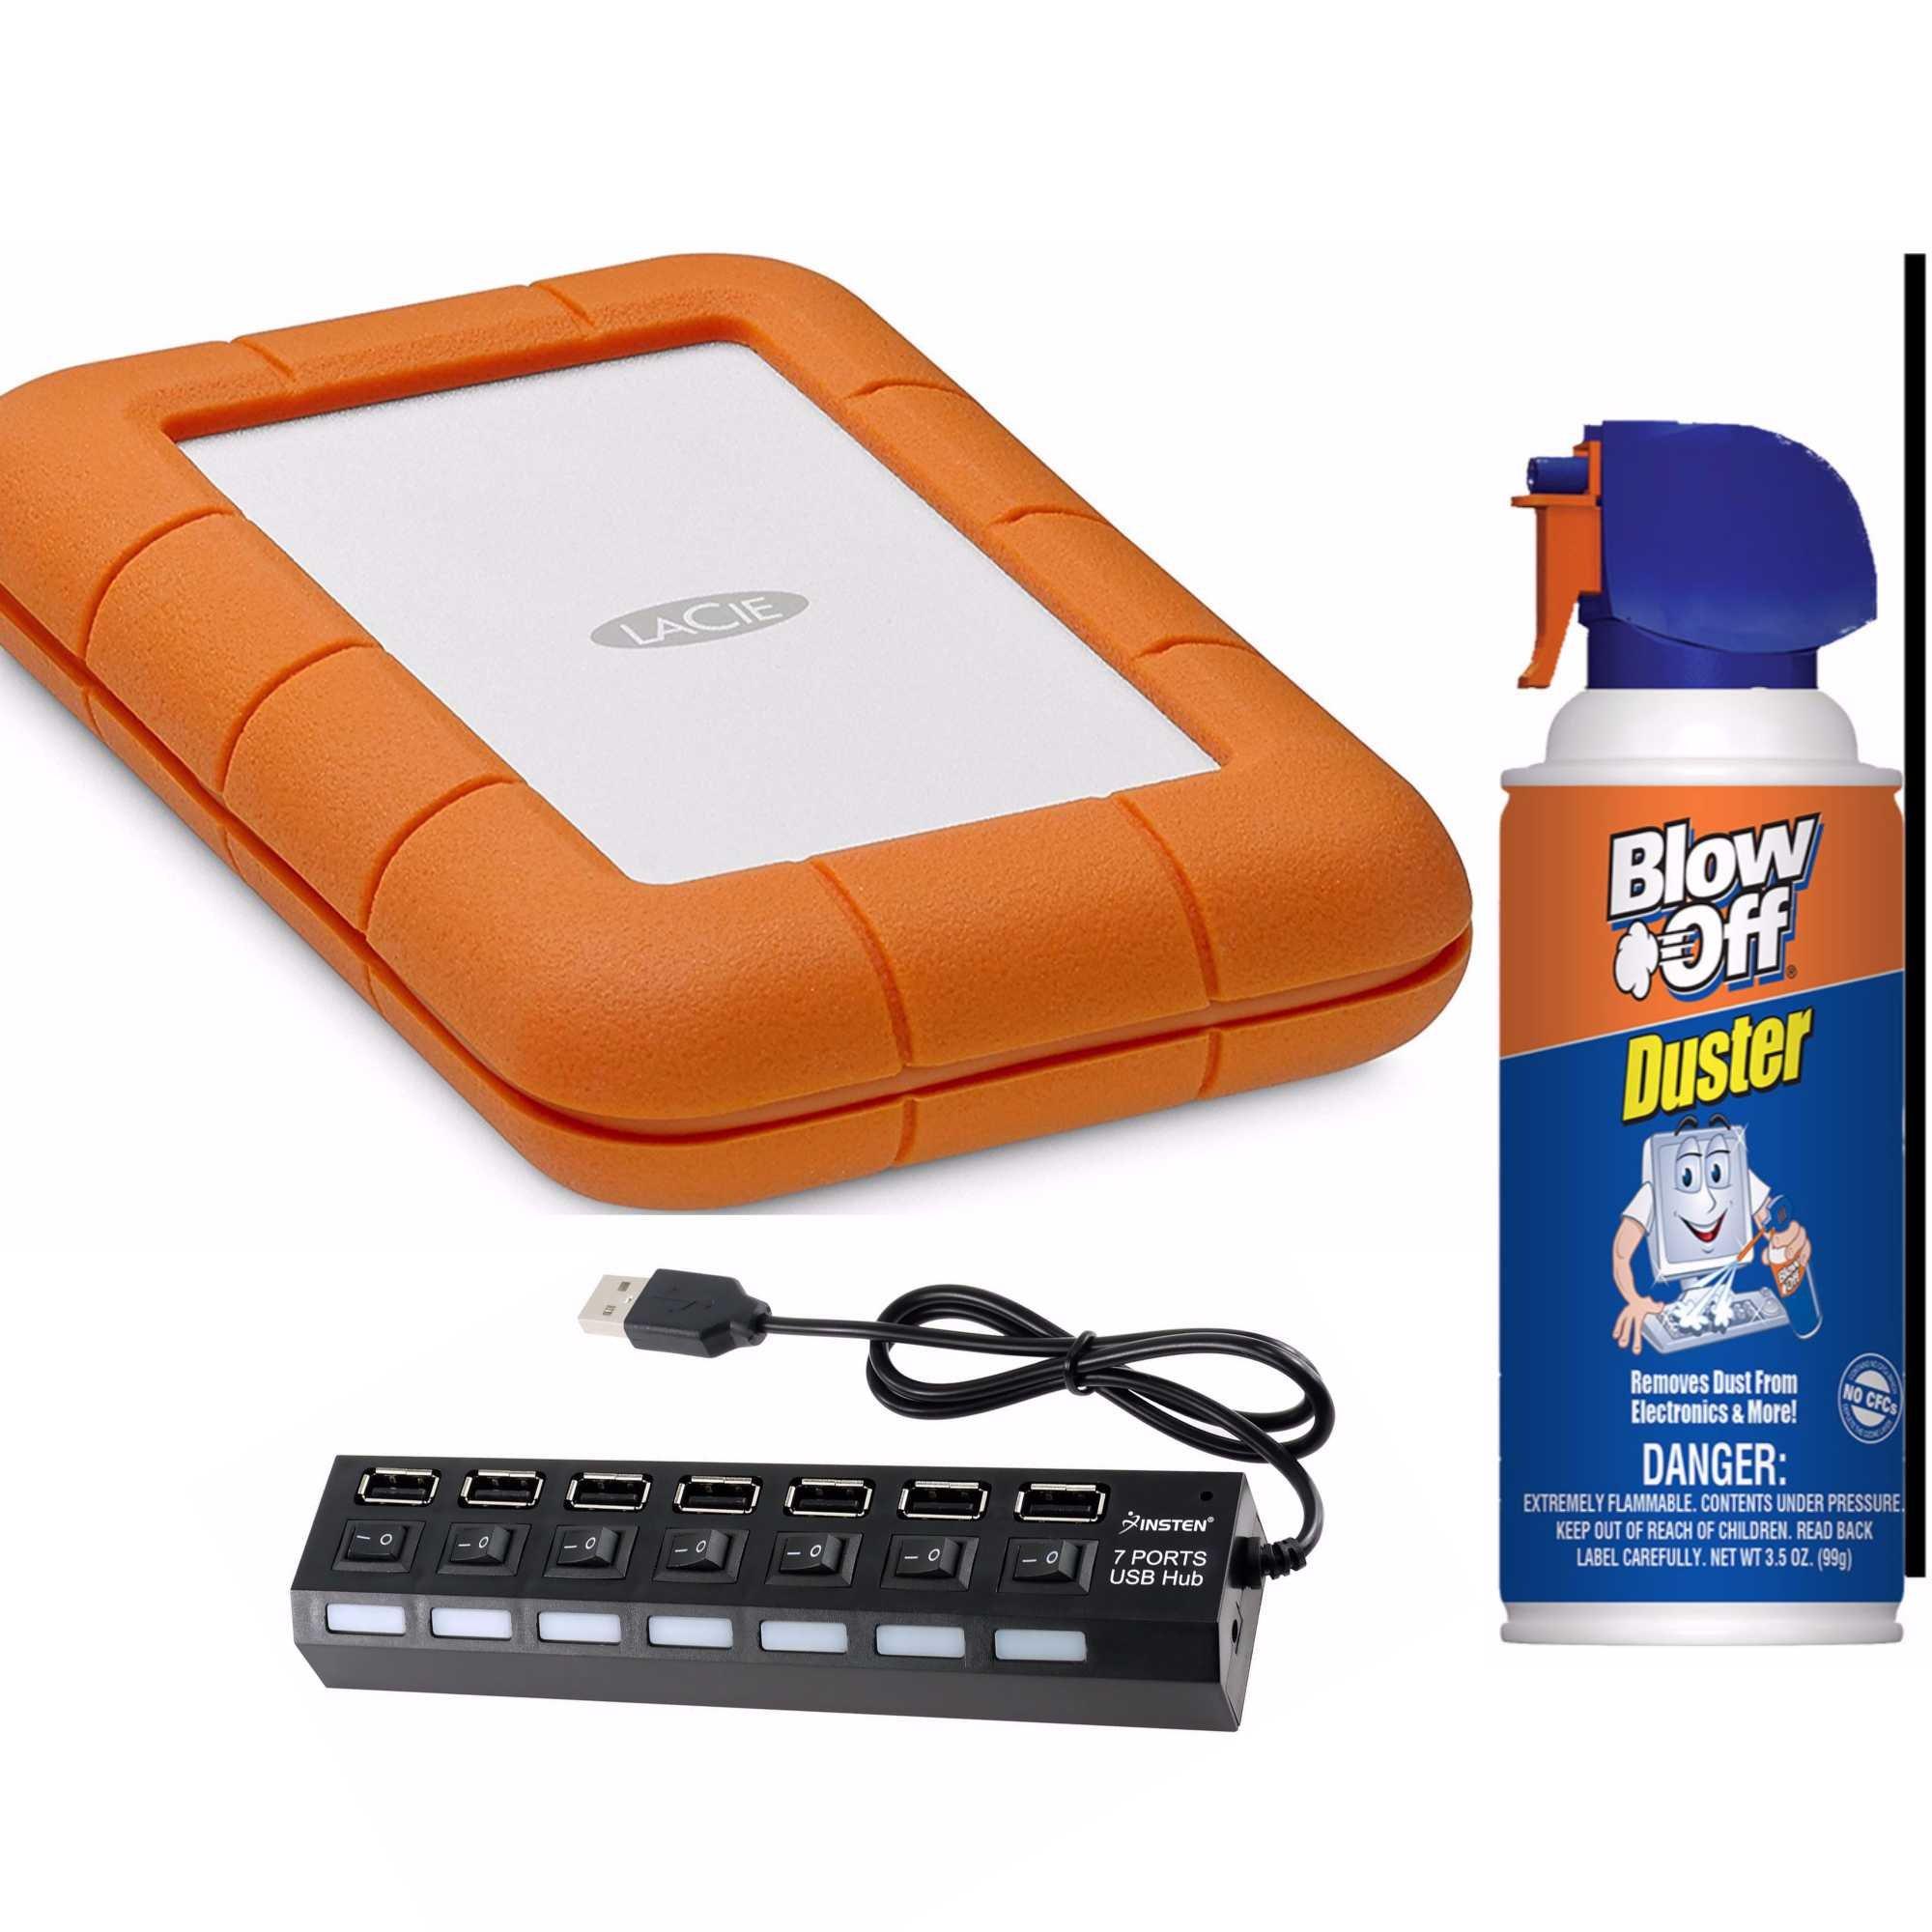 LaCie Rugged Thunderbolt USB-C 1TB SSD Portable Hard Drive (STFS1000401) bundle